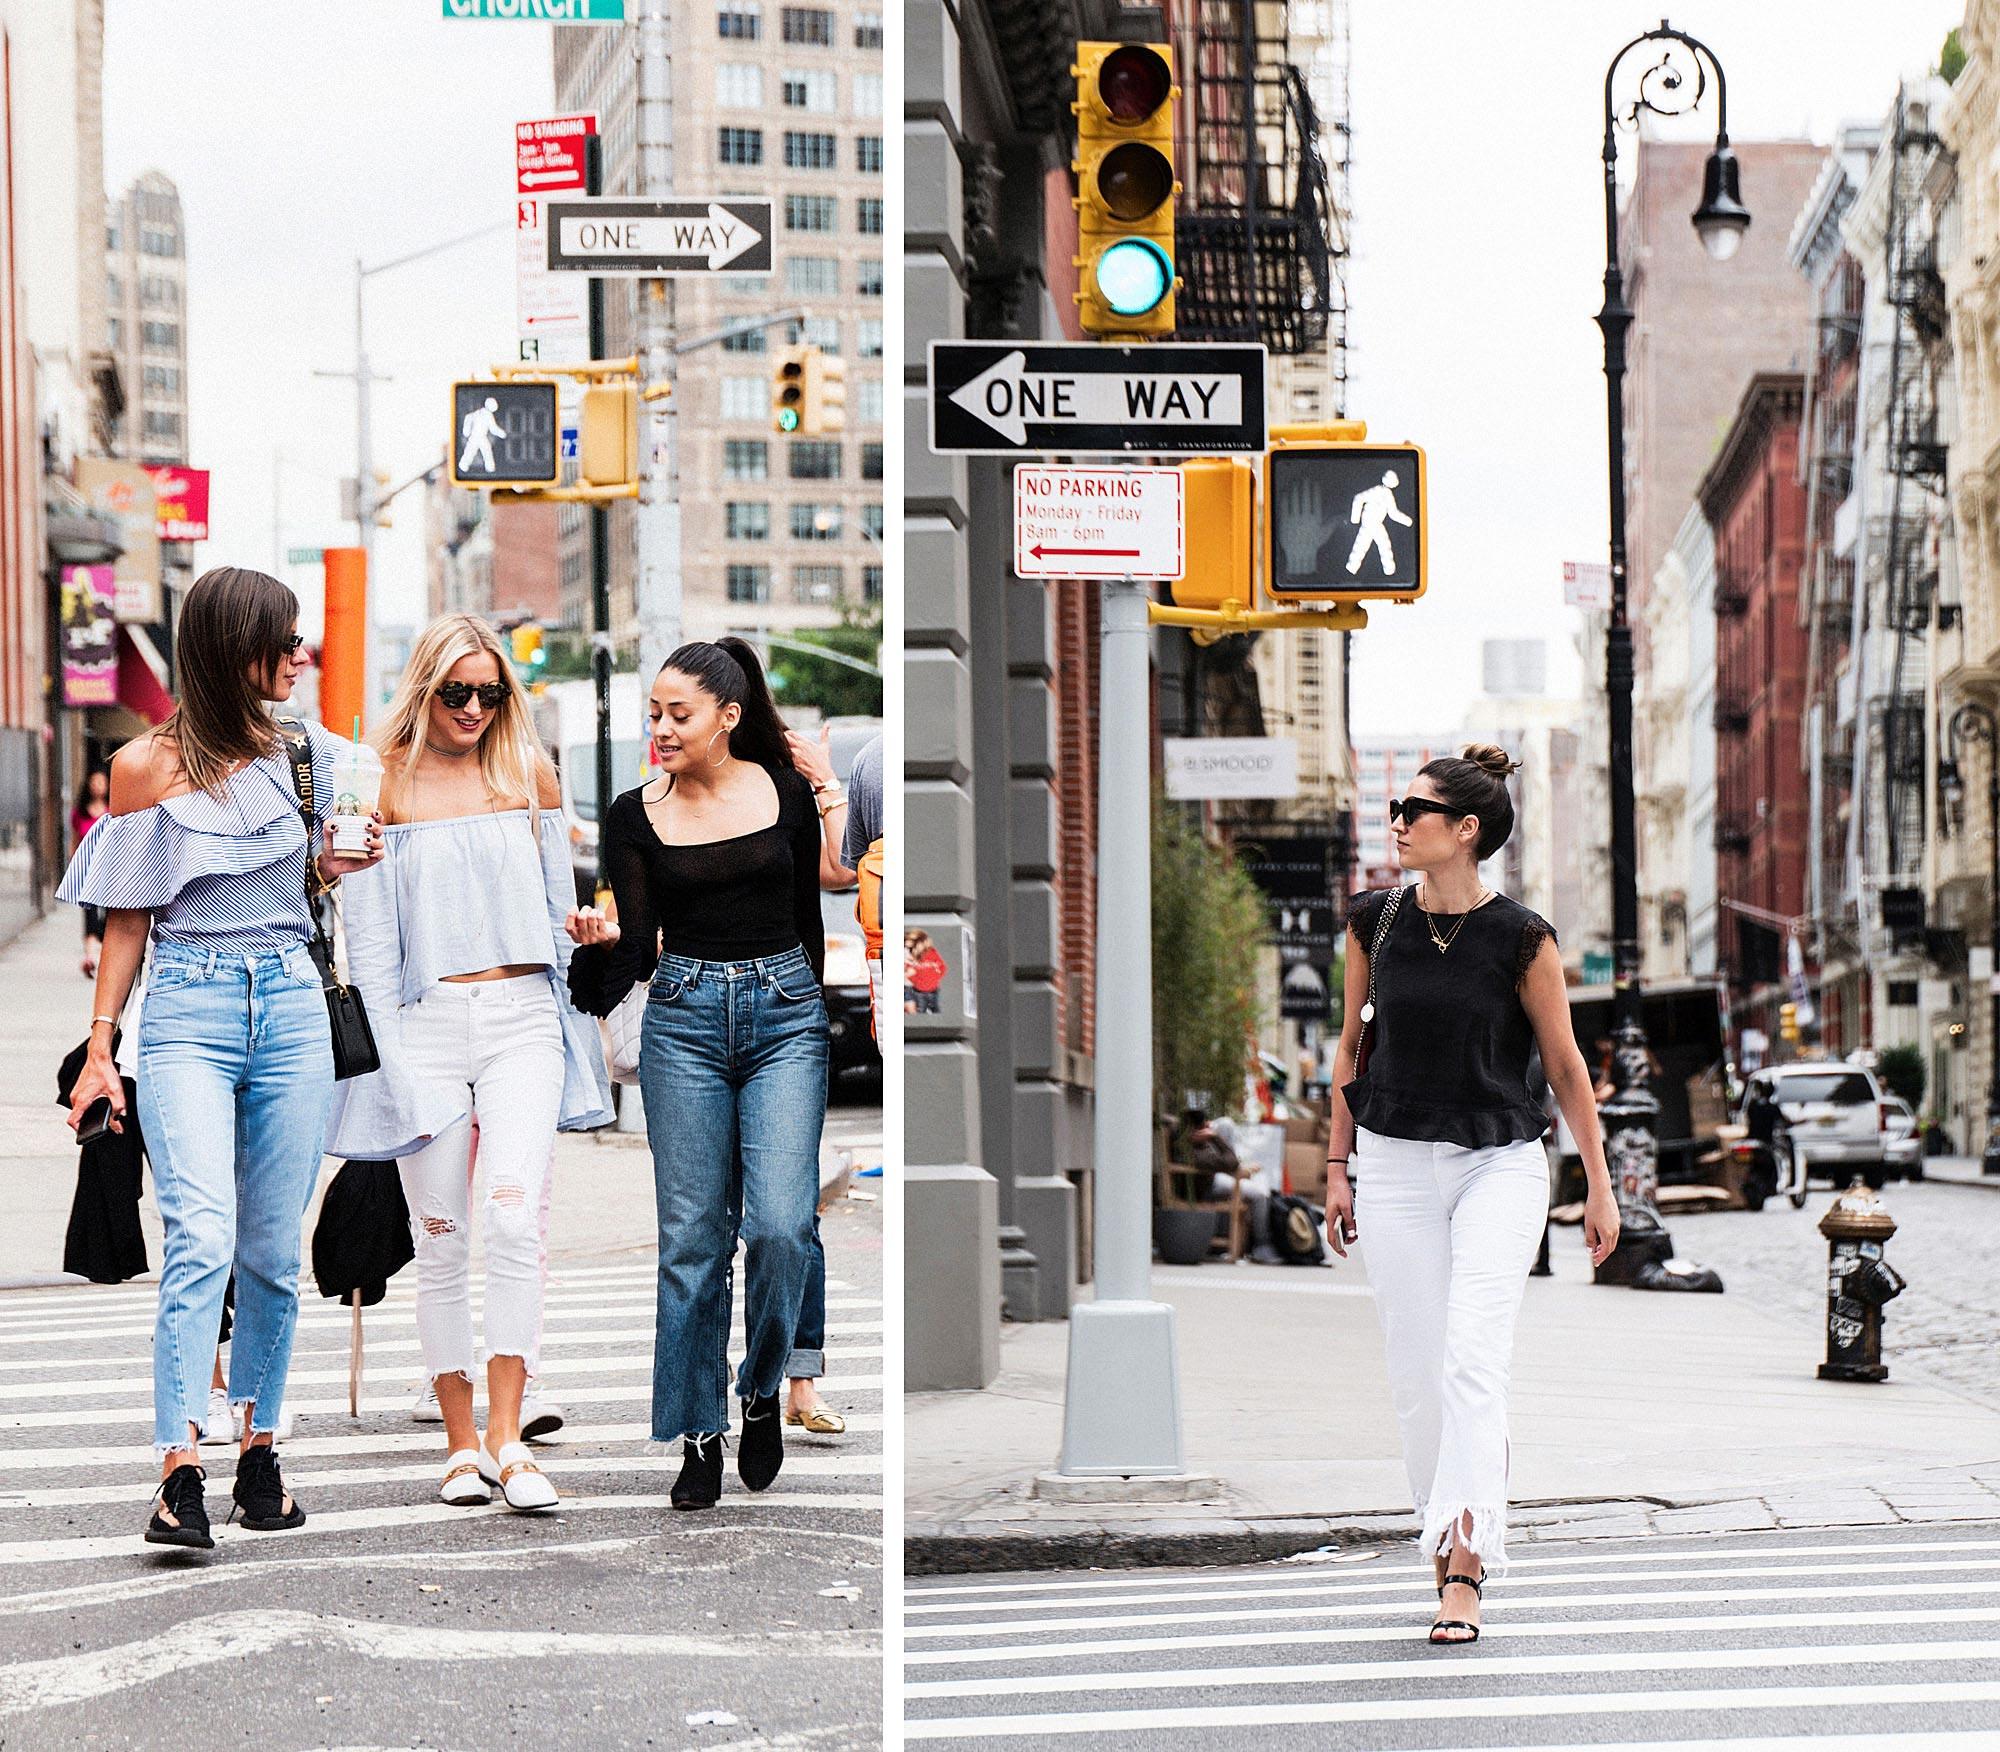 SYOSS-Trendwatch-NYC-007.jpg